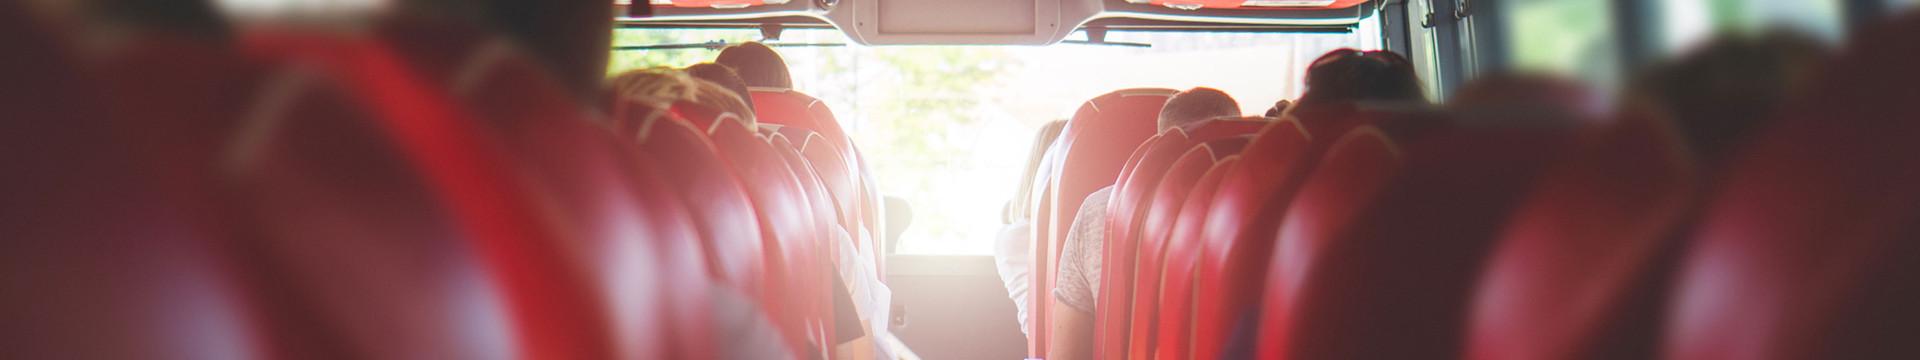 Tennessee Bus Tour Groups - Gatlinburg Group Lodging